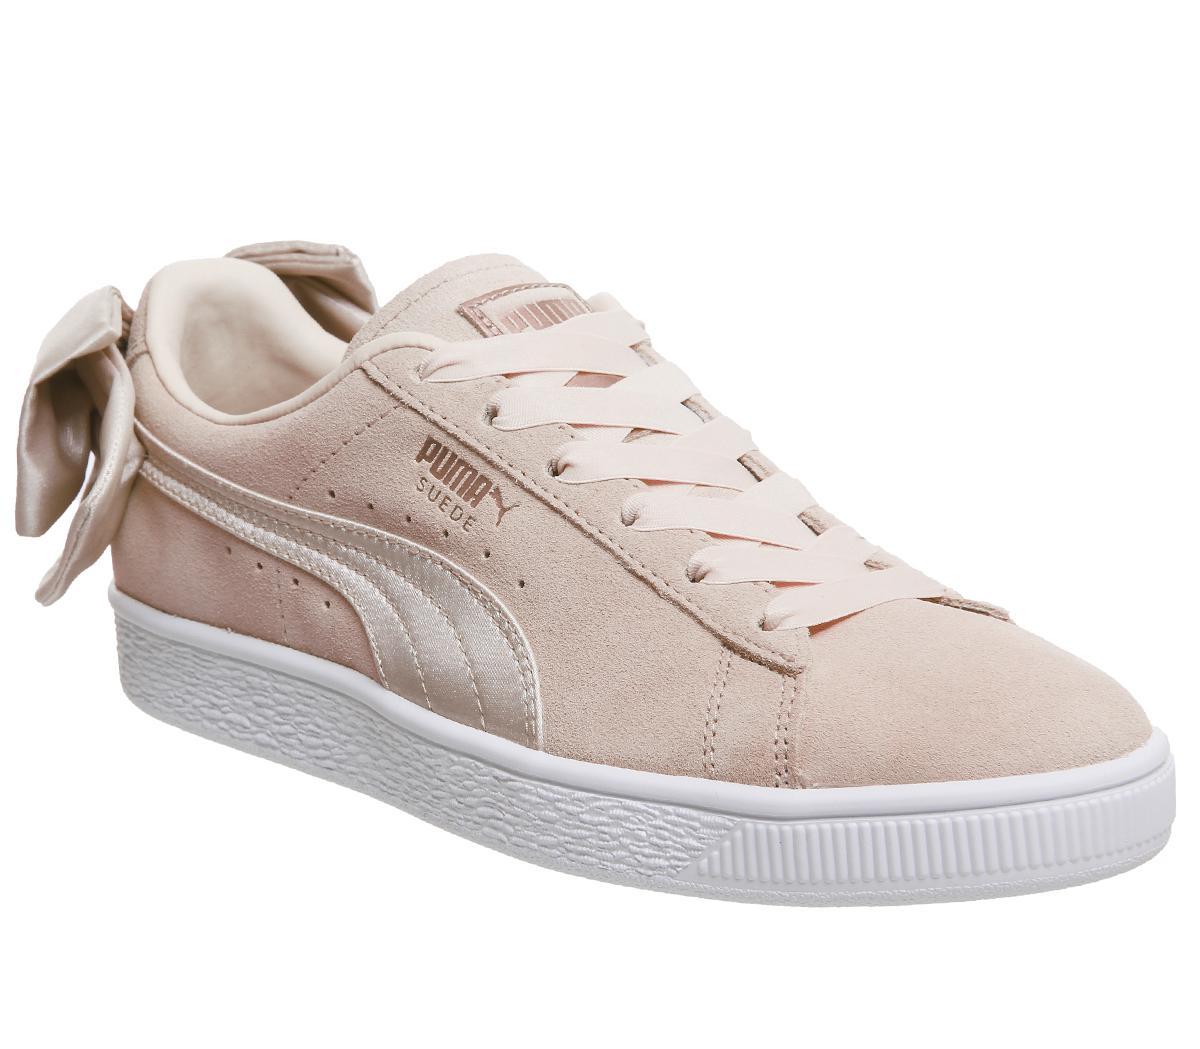 Puma Suede Bow Trainers Cream Tan